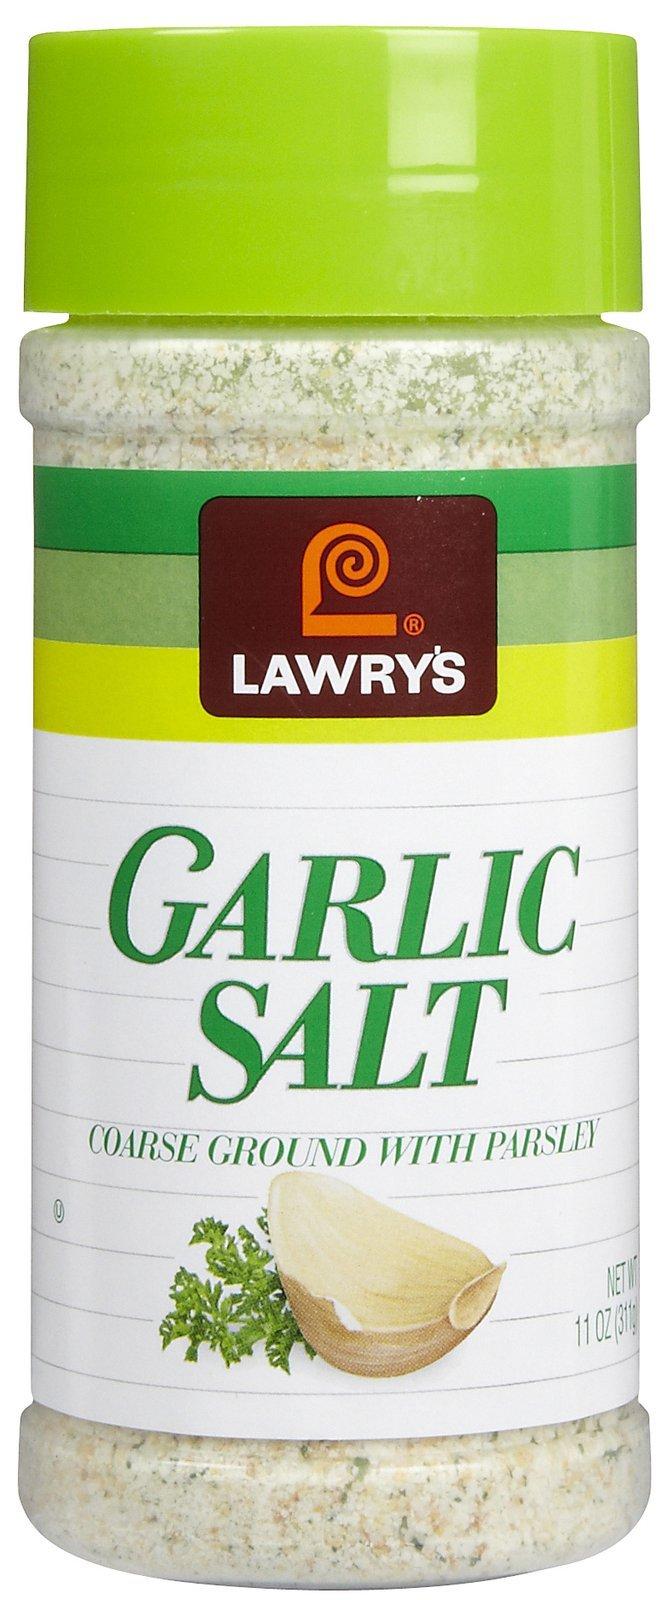 Lawry's Garlic Salt with Parsley, 311 grams